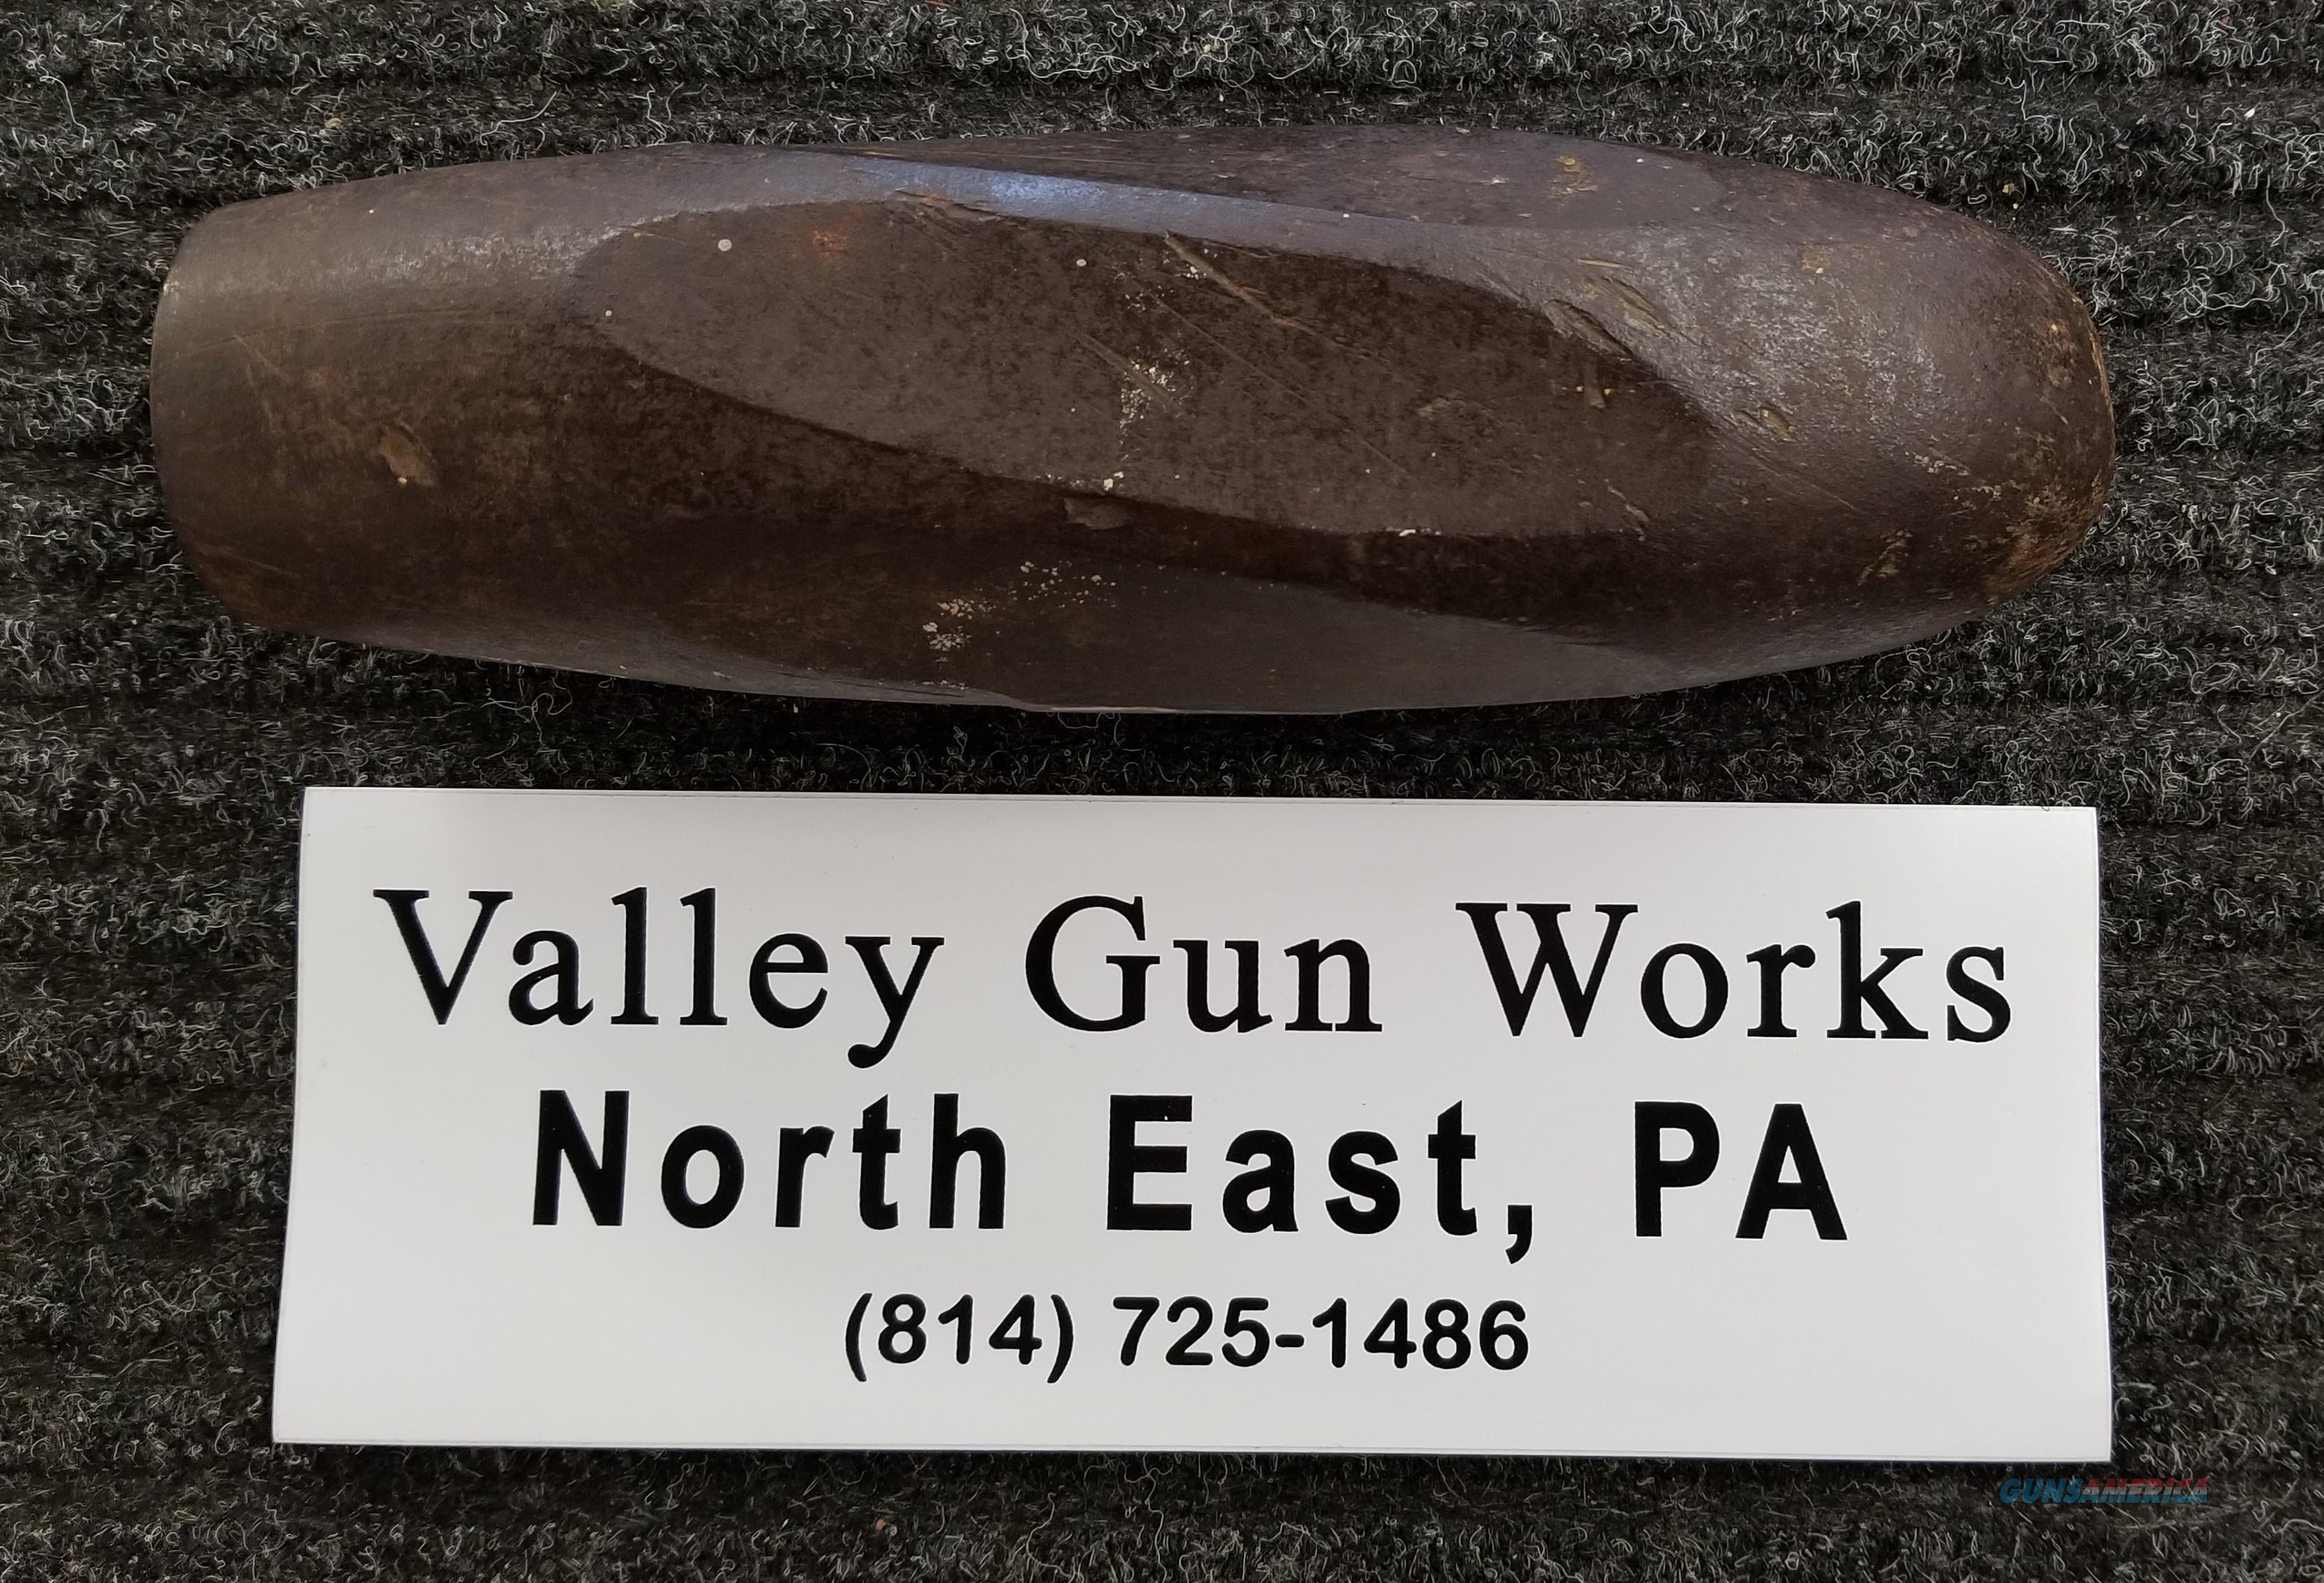 Whitworth Rifled Cannon Projectile - Civil War - Free Shipping  Non-Guns > Ammunition